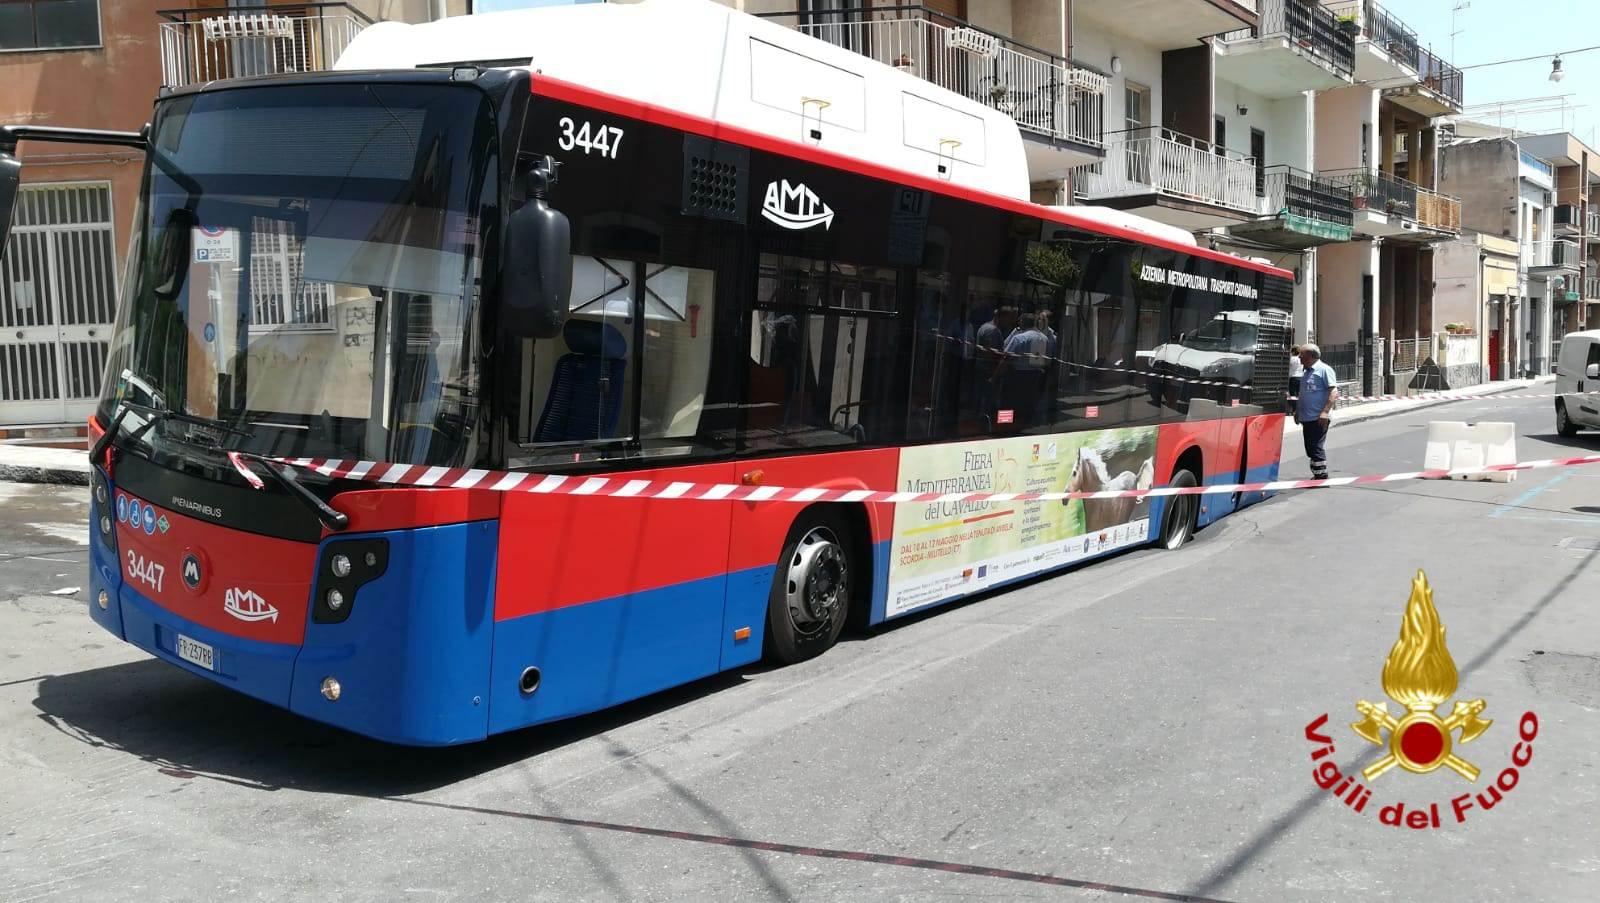 Bus Amt sprofonda in buca: paura tra i passeggeri – FOTO